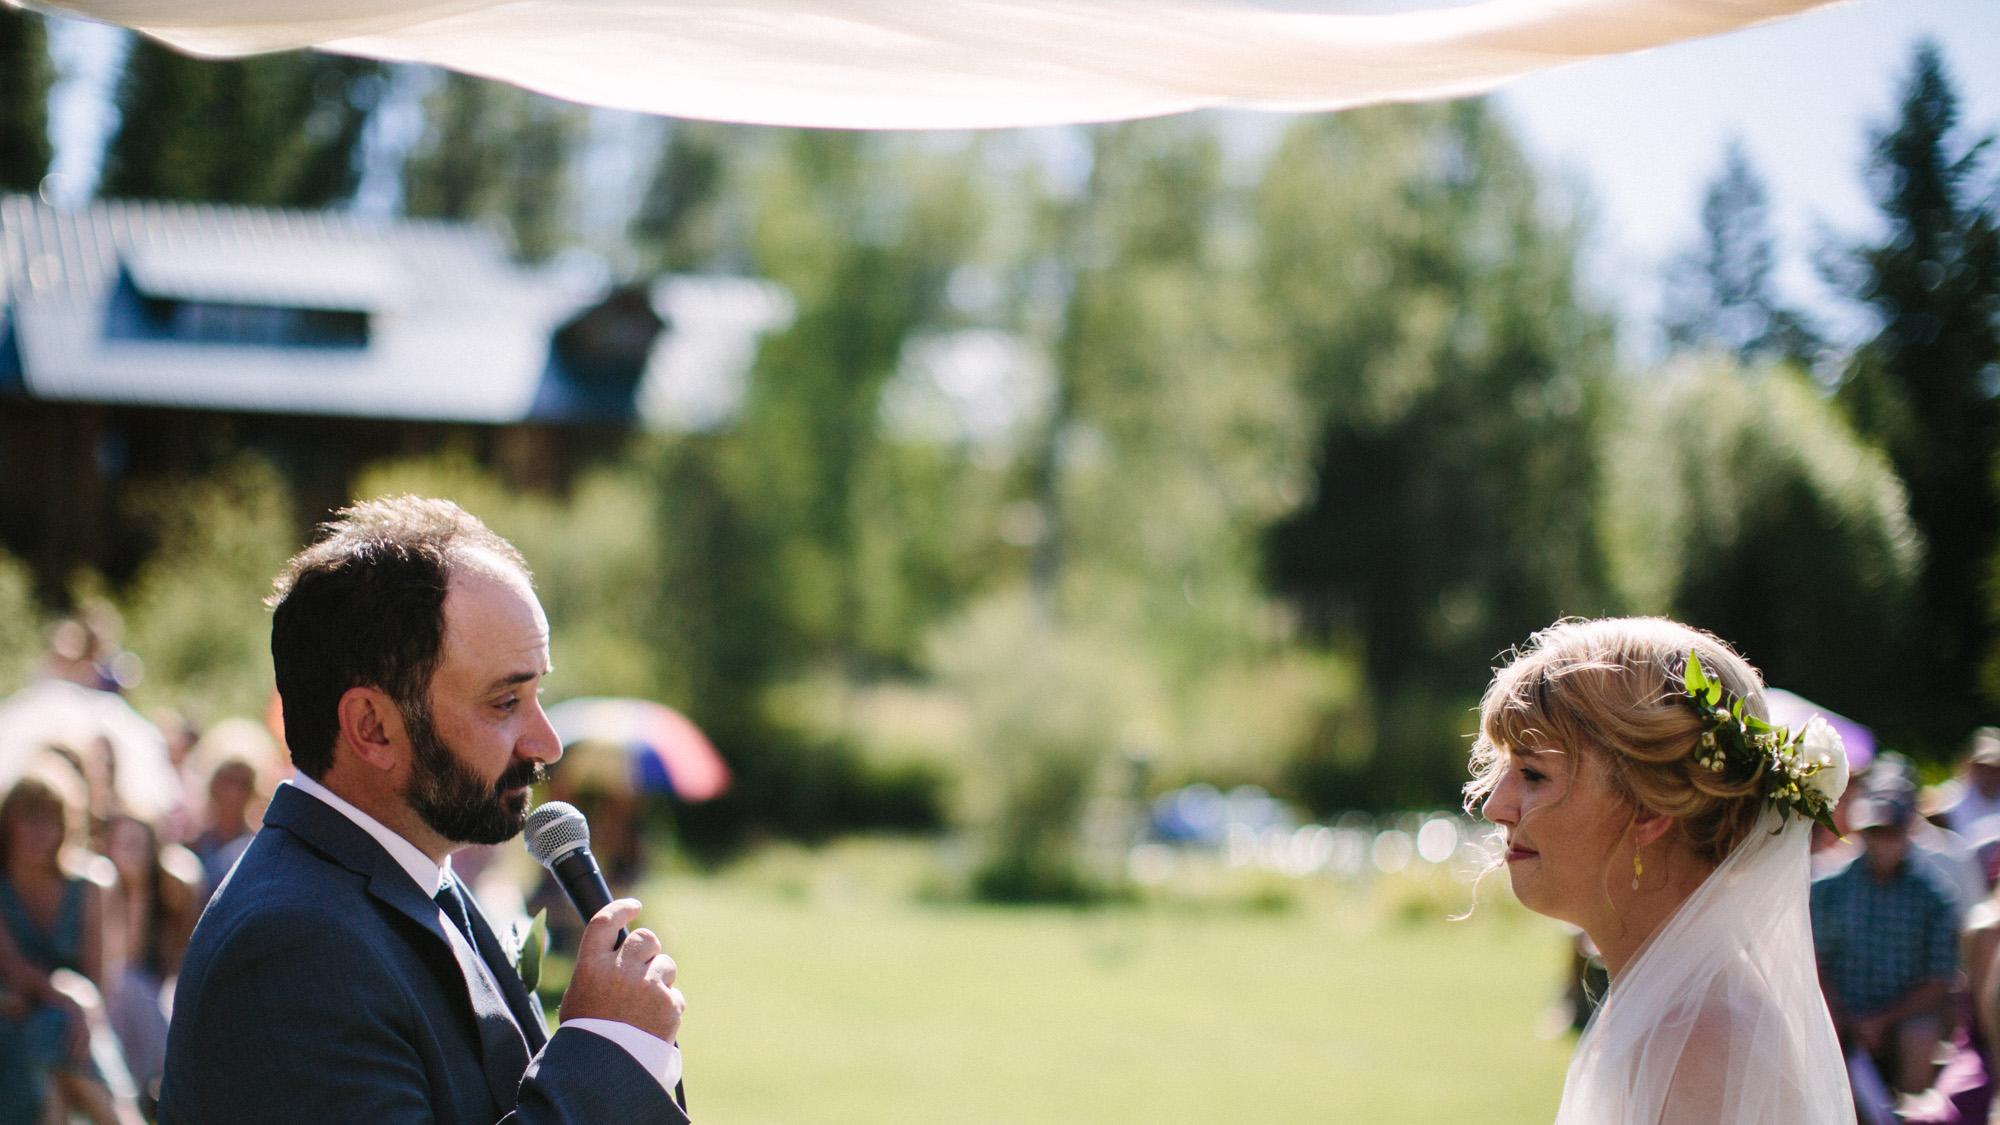 Montana_Wedding_Photos_alec_vanderboom-0092.jpg